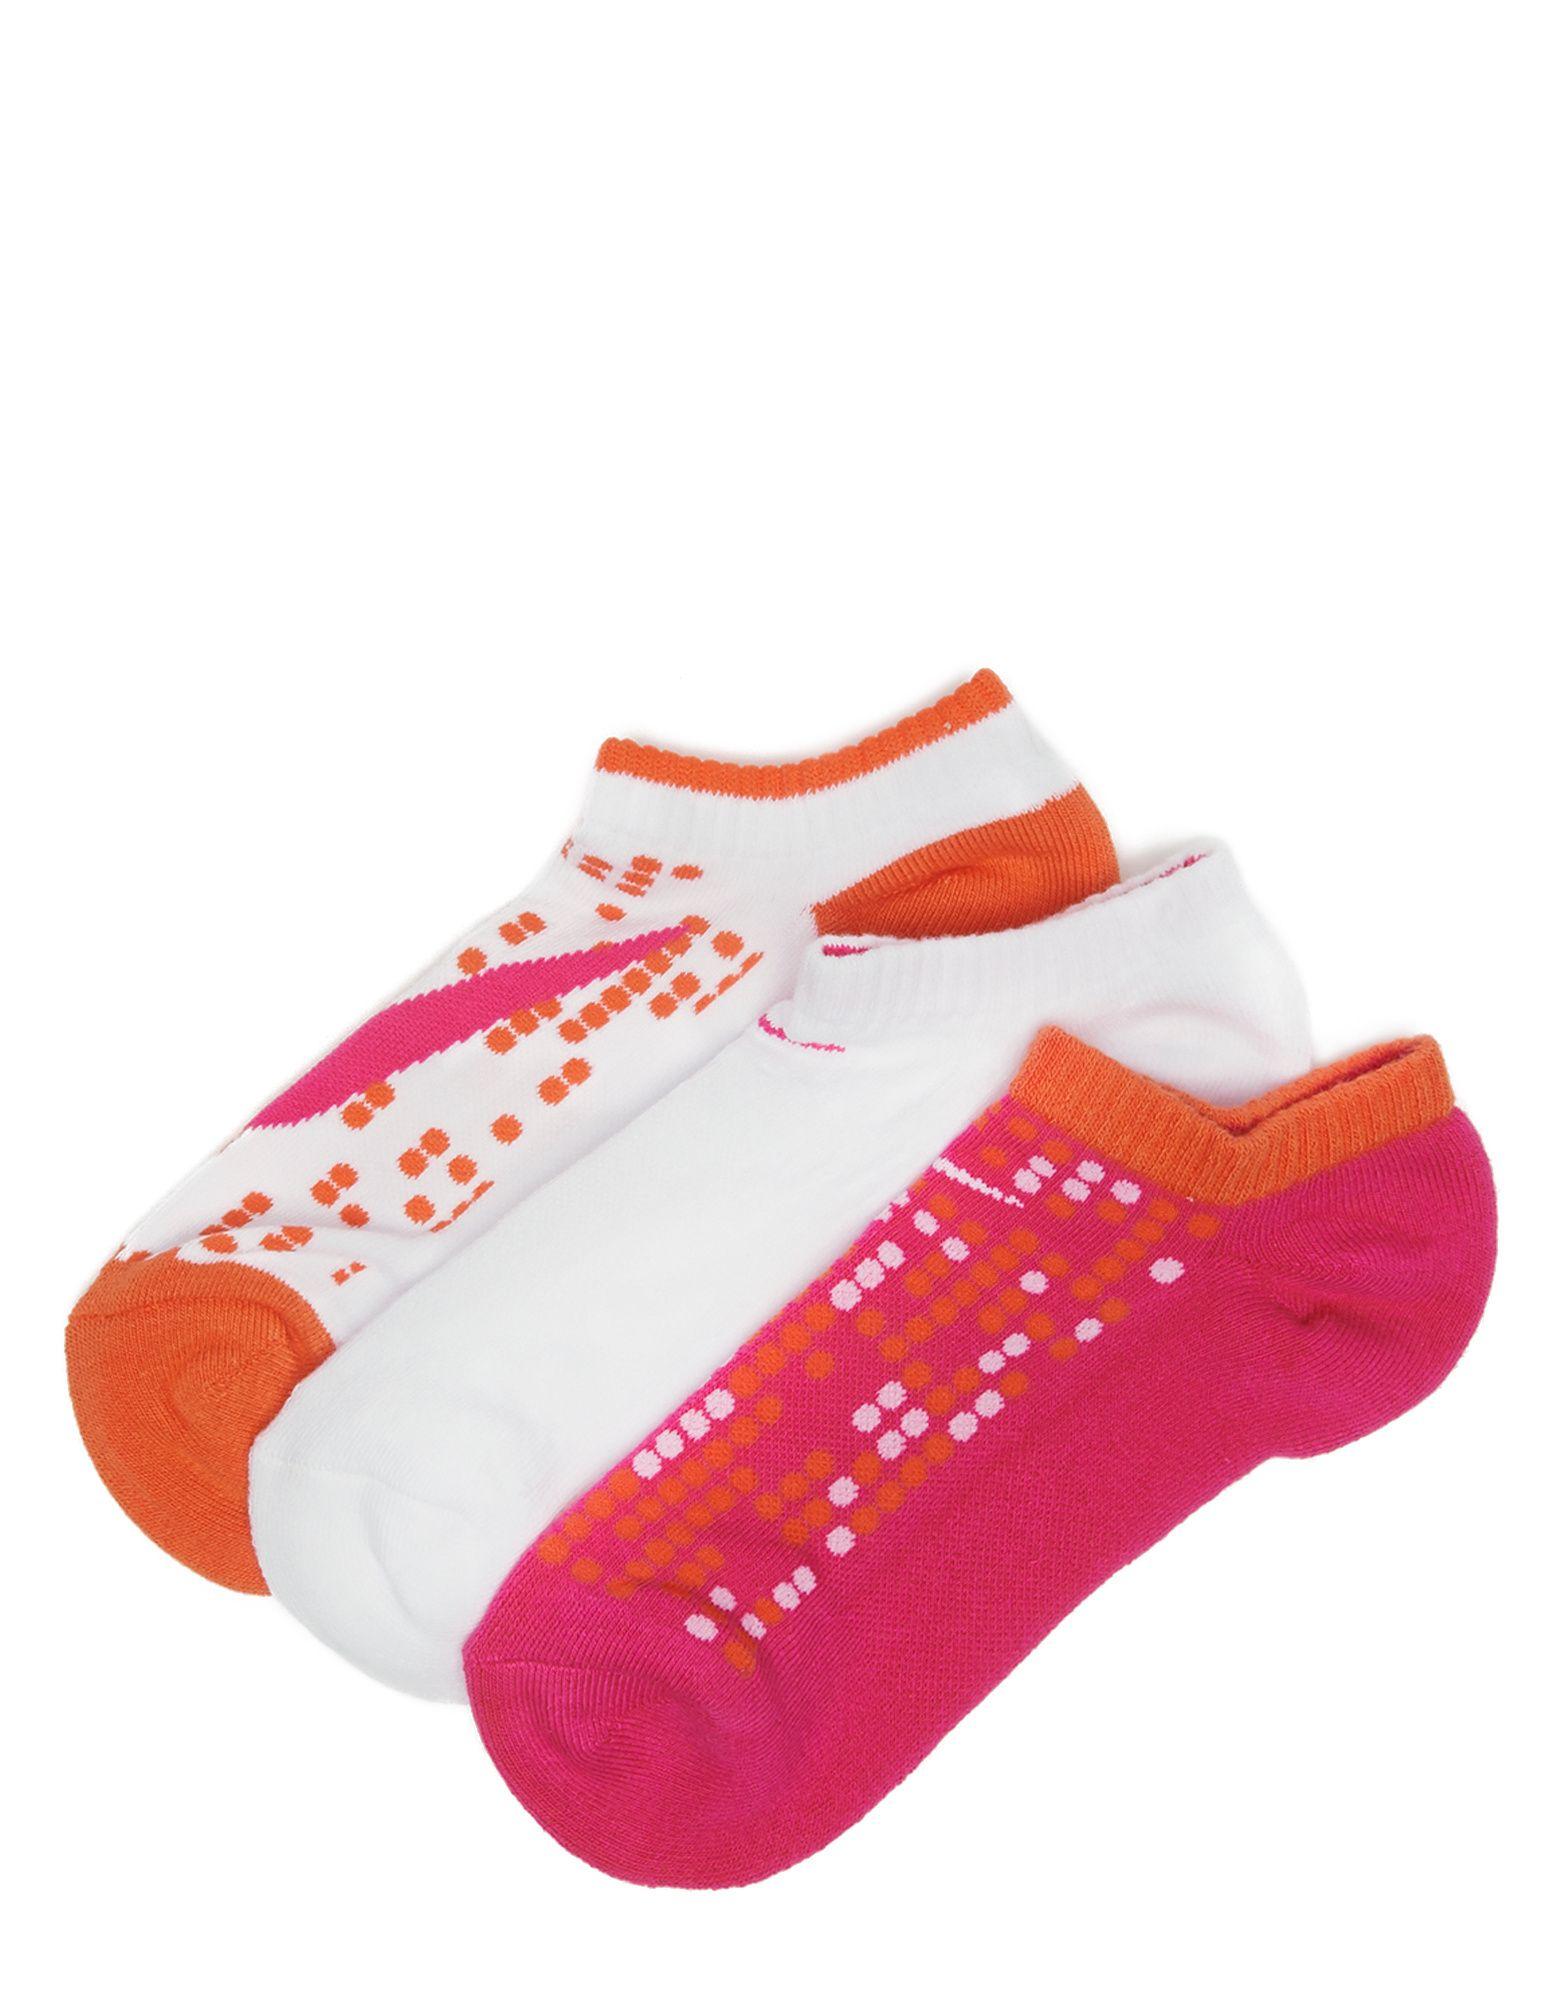 Nike 3 Pack Girls Low Ped Socks